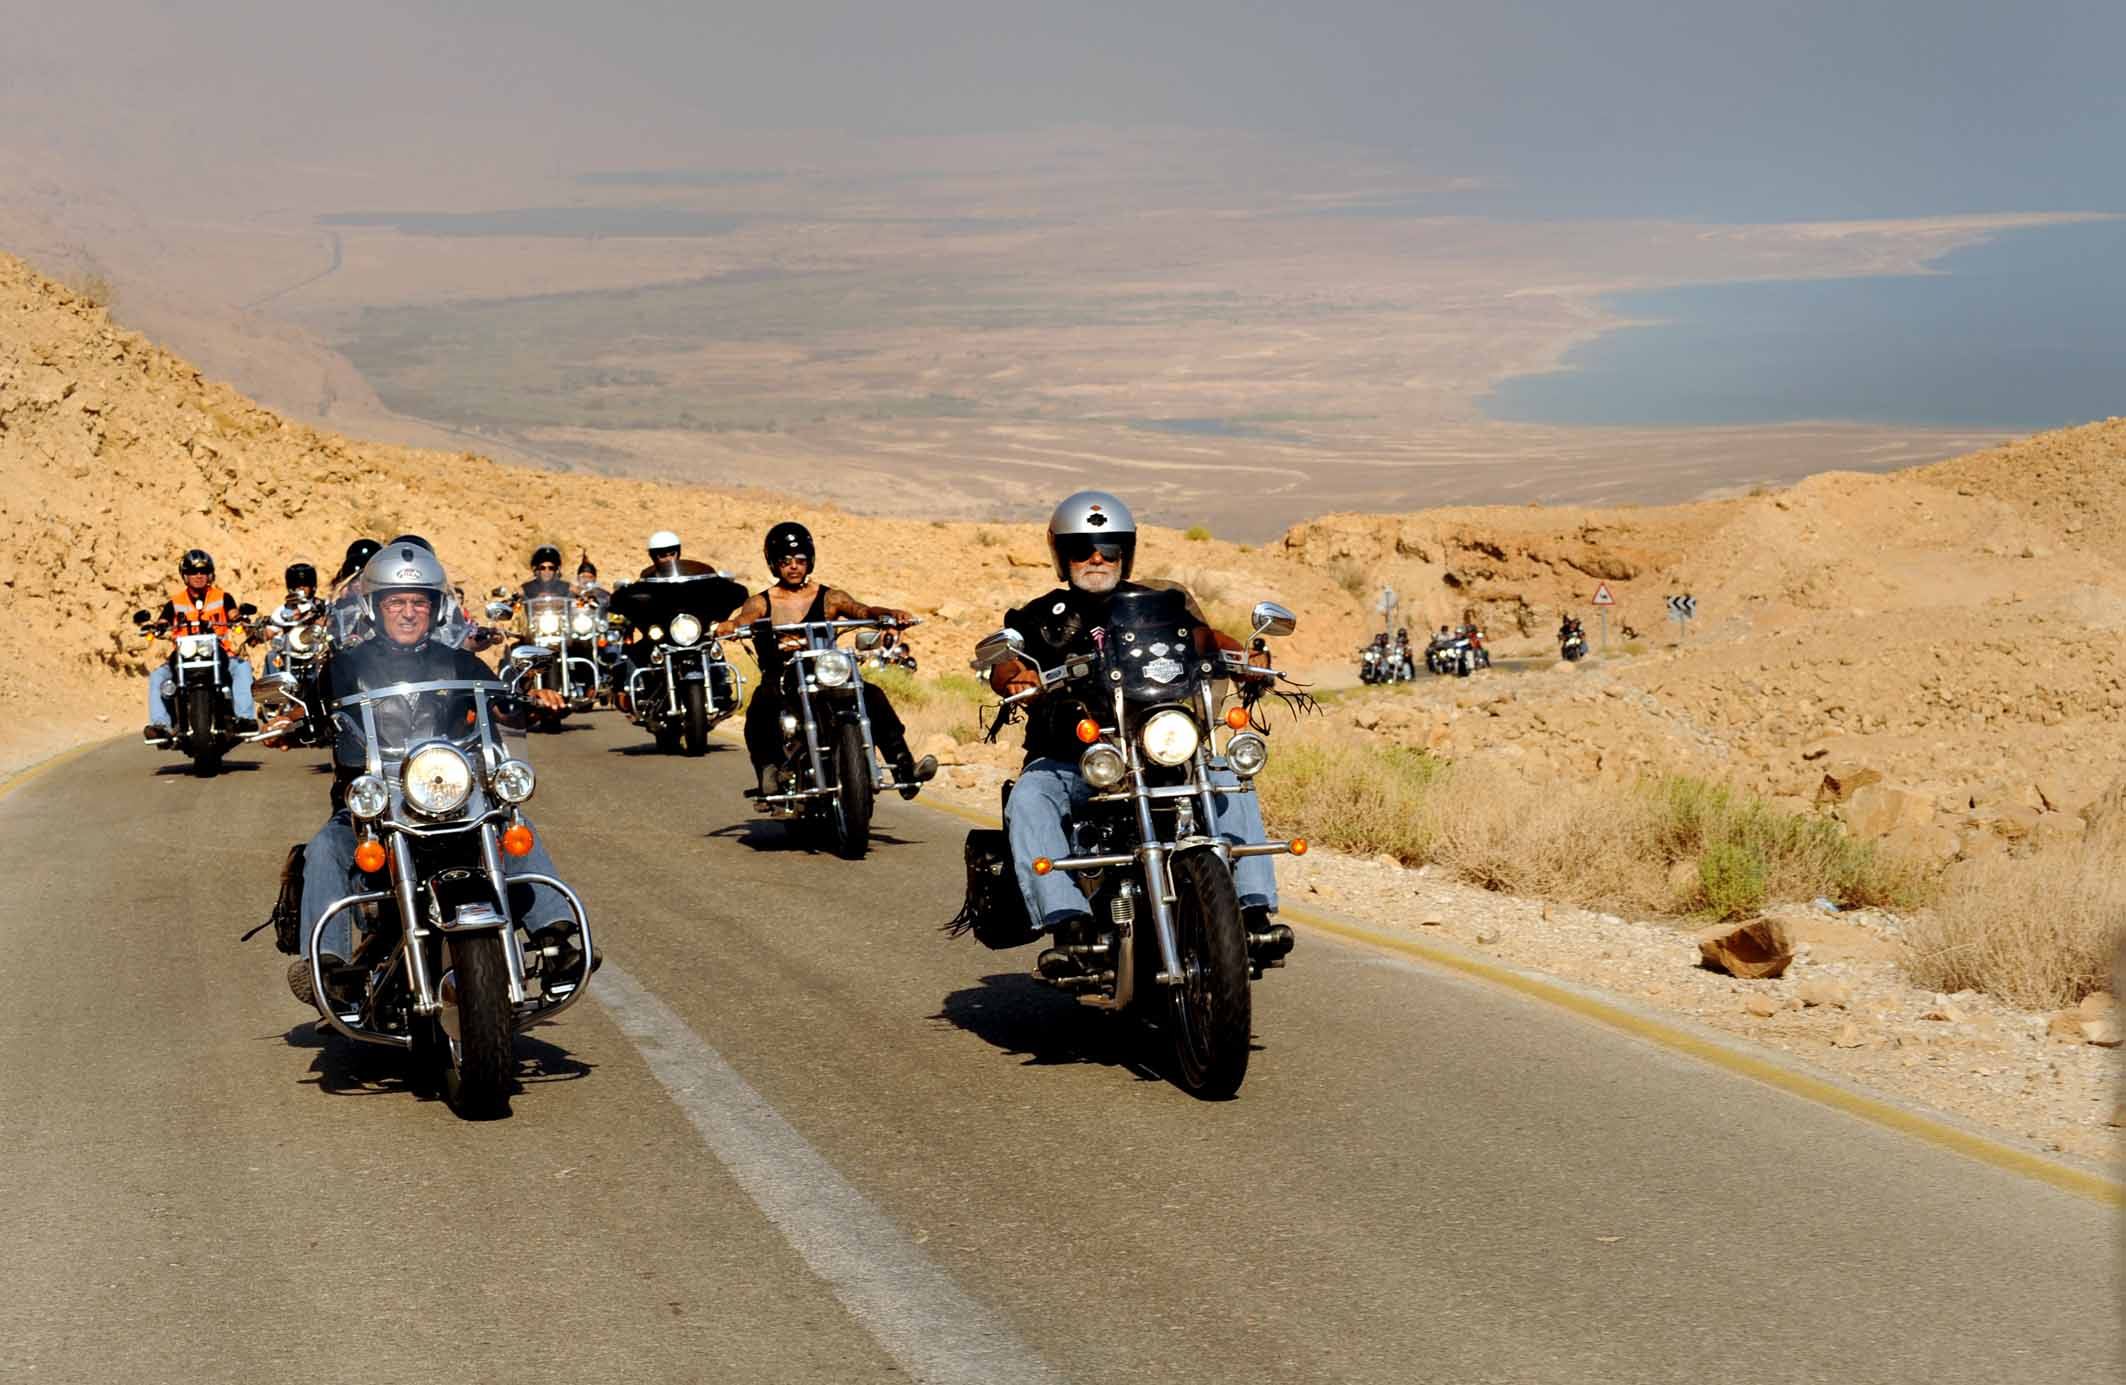 harley davidson posse ride essay